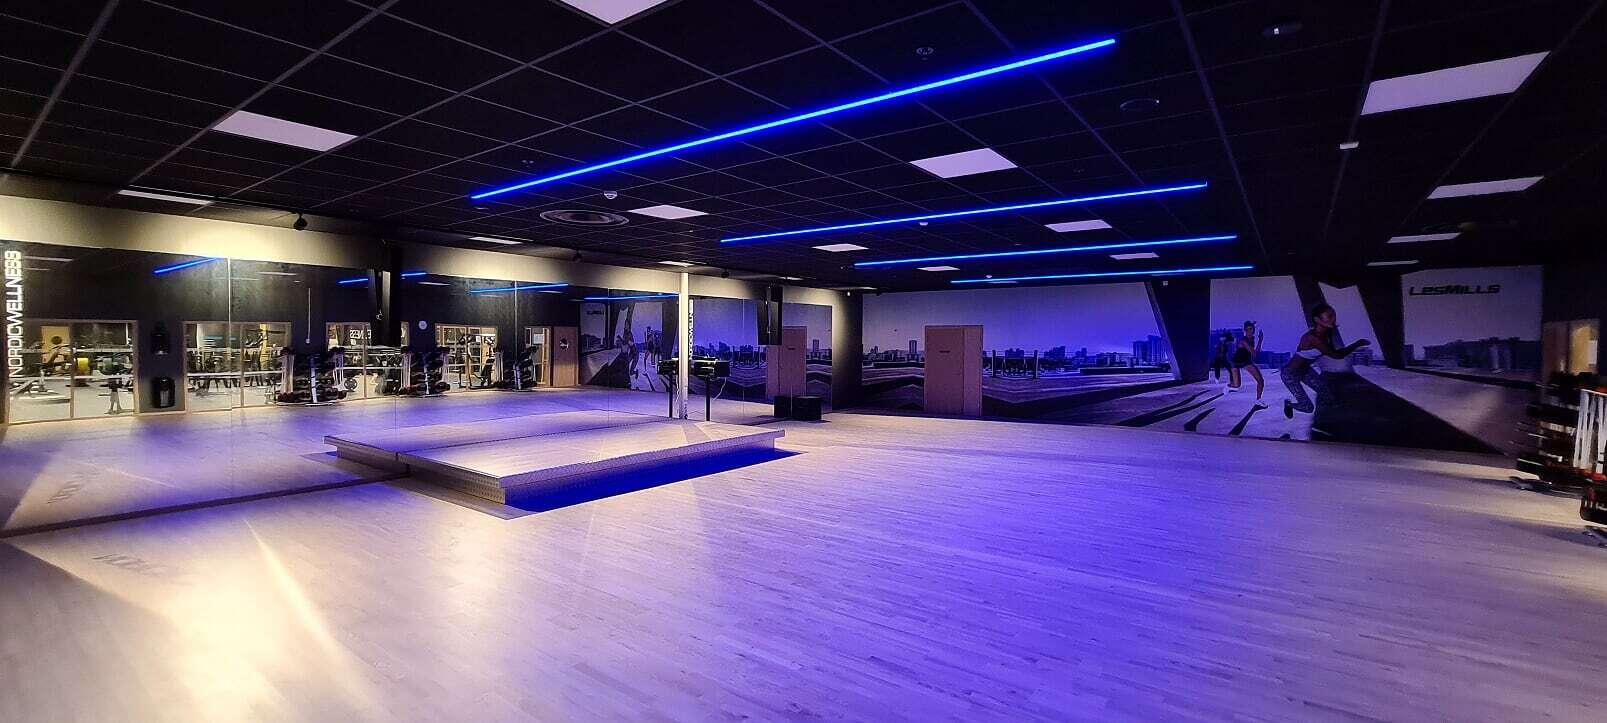 RGB ljusslinga tak gym